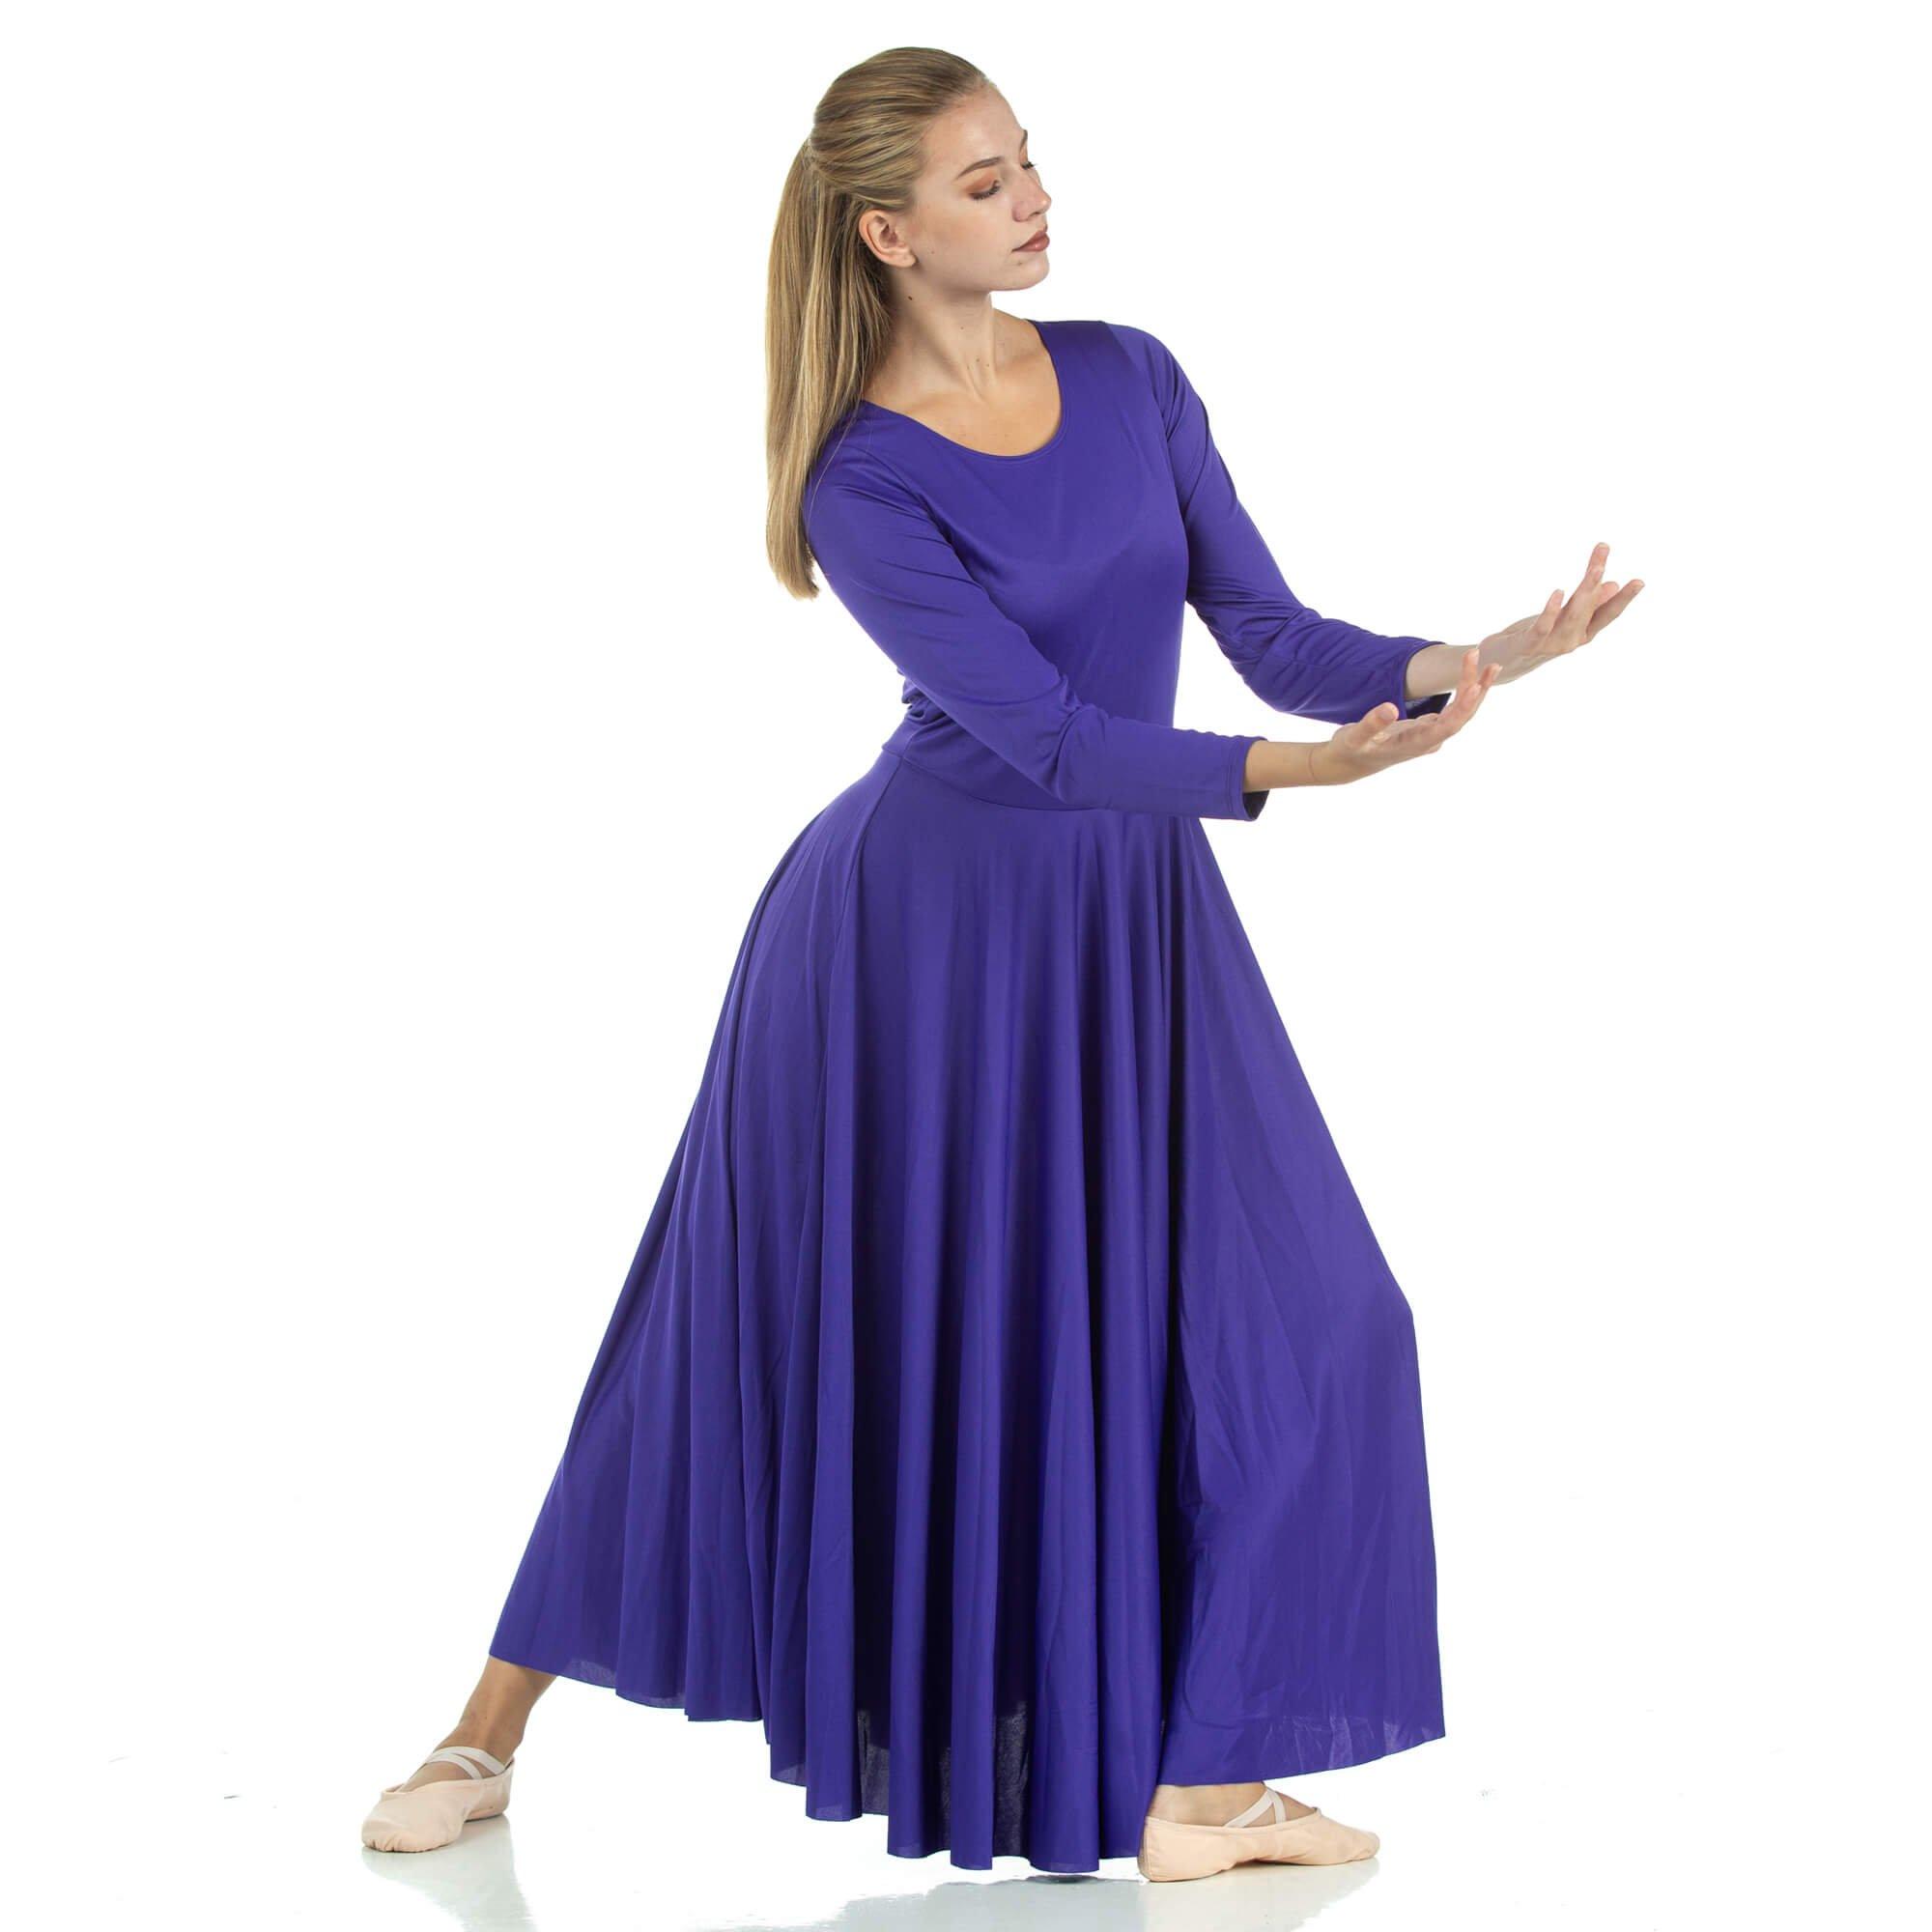 Danzcue Womens Praise Loose Fit Full Length Long Sleeve Dance Dress, Deep Purple, Small by Danzcue